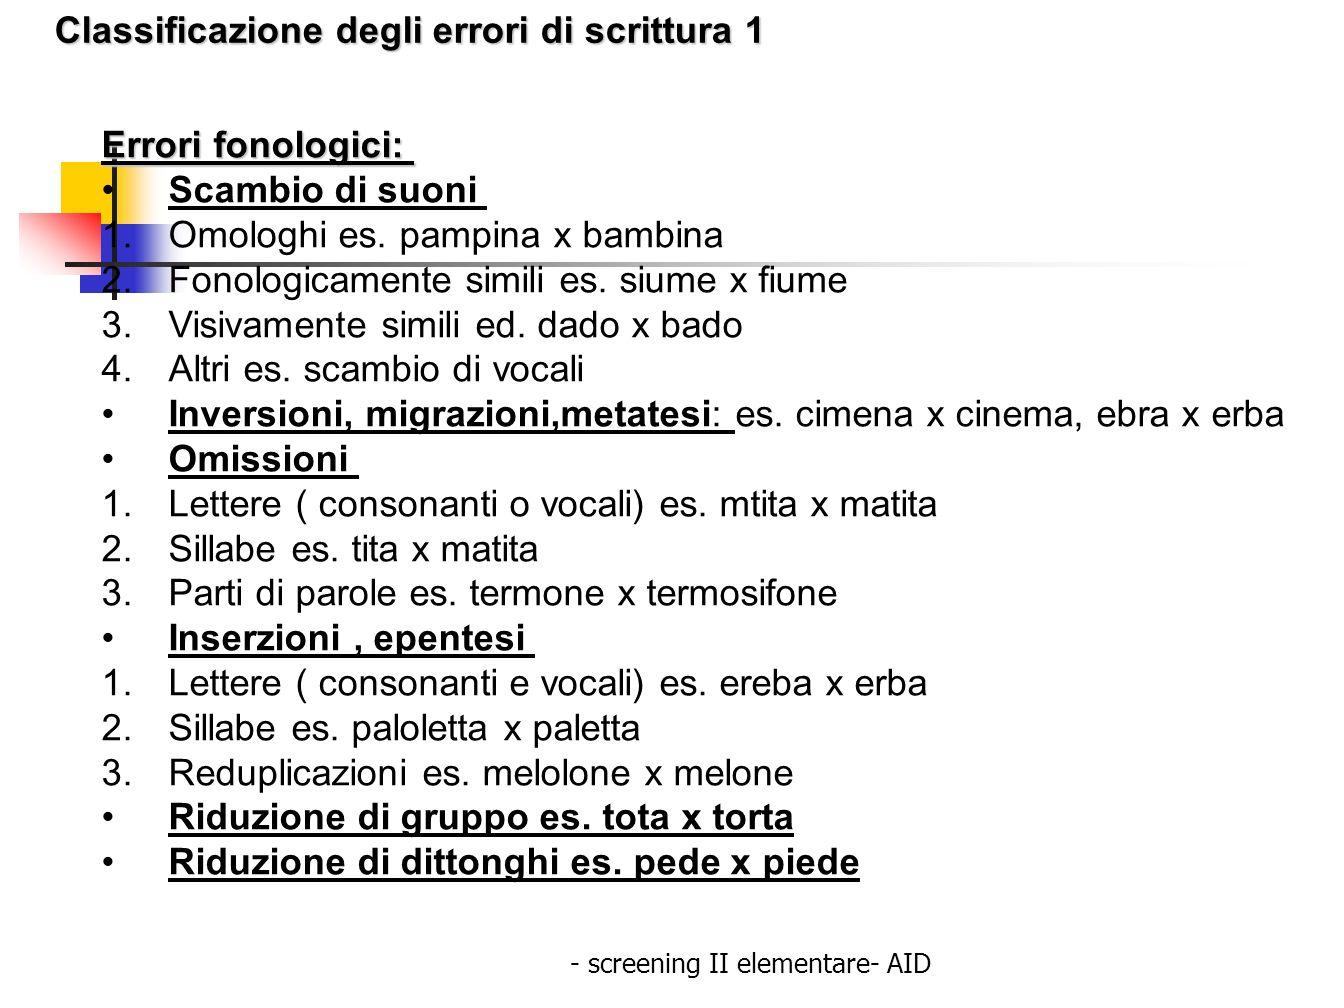 - screening II elementare- AID